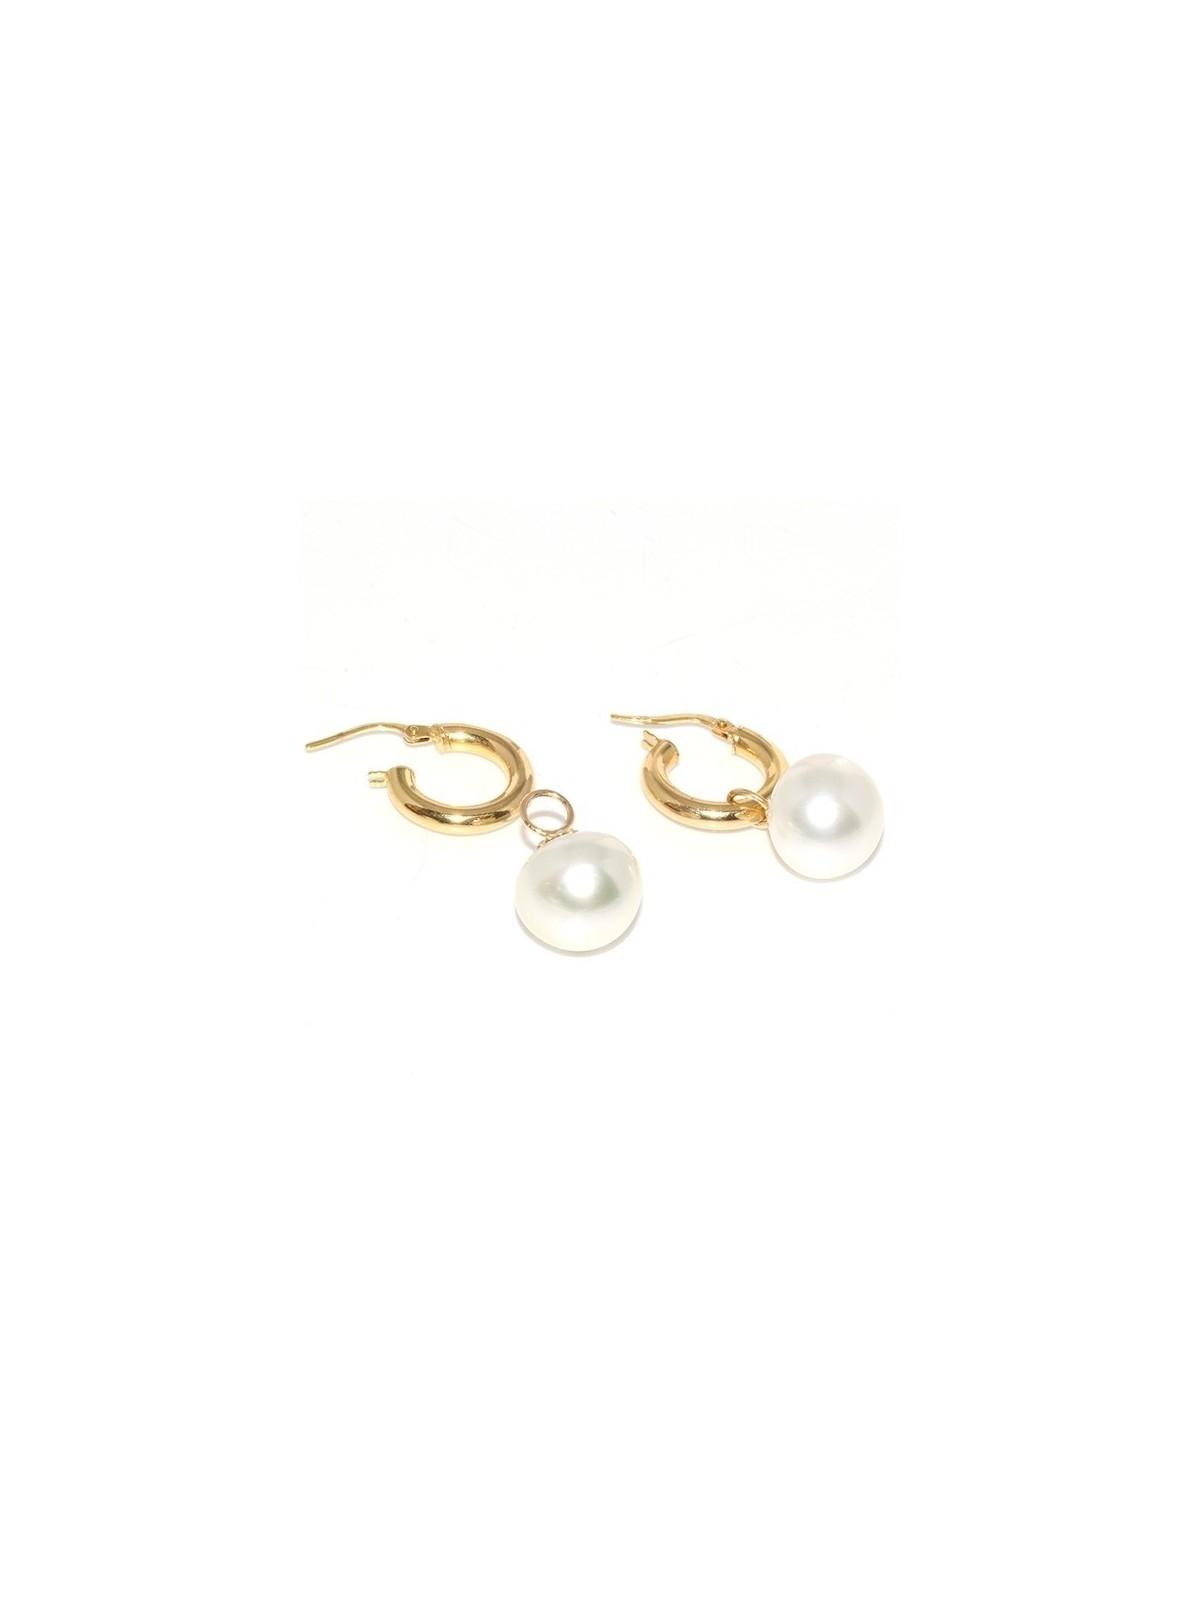 Boucles d'oreilles créoles Faanui Moea Perles - 2